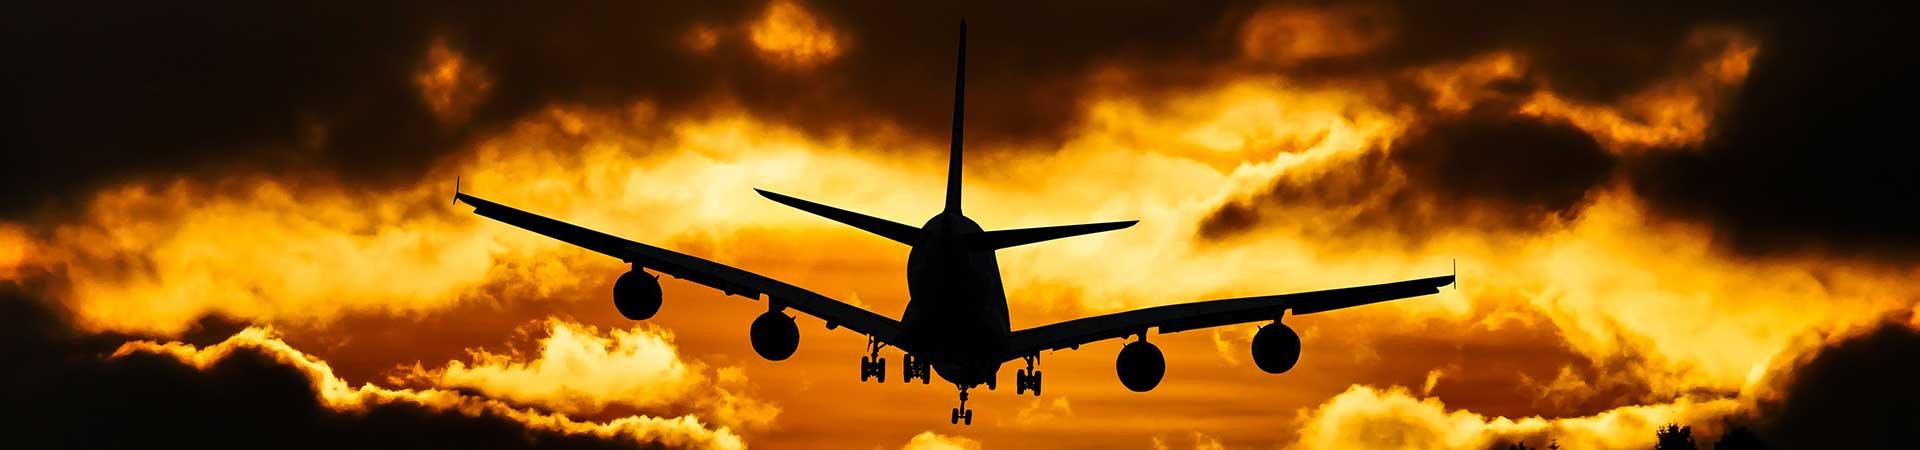 Tarieven Airports